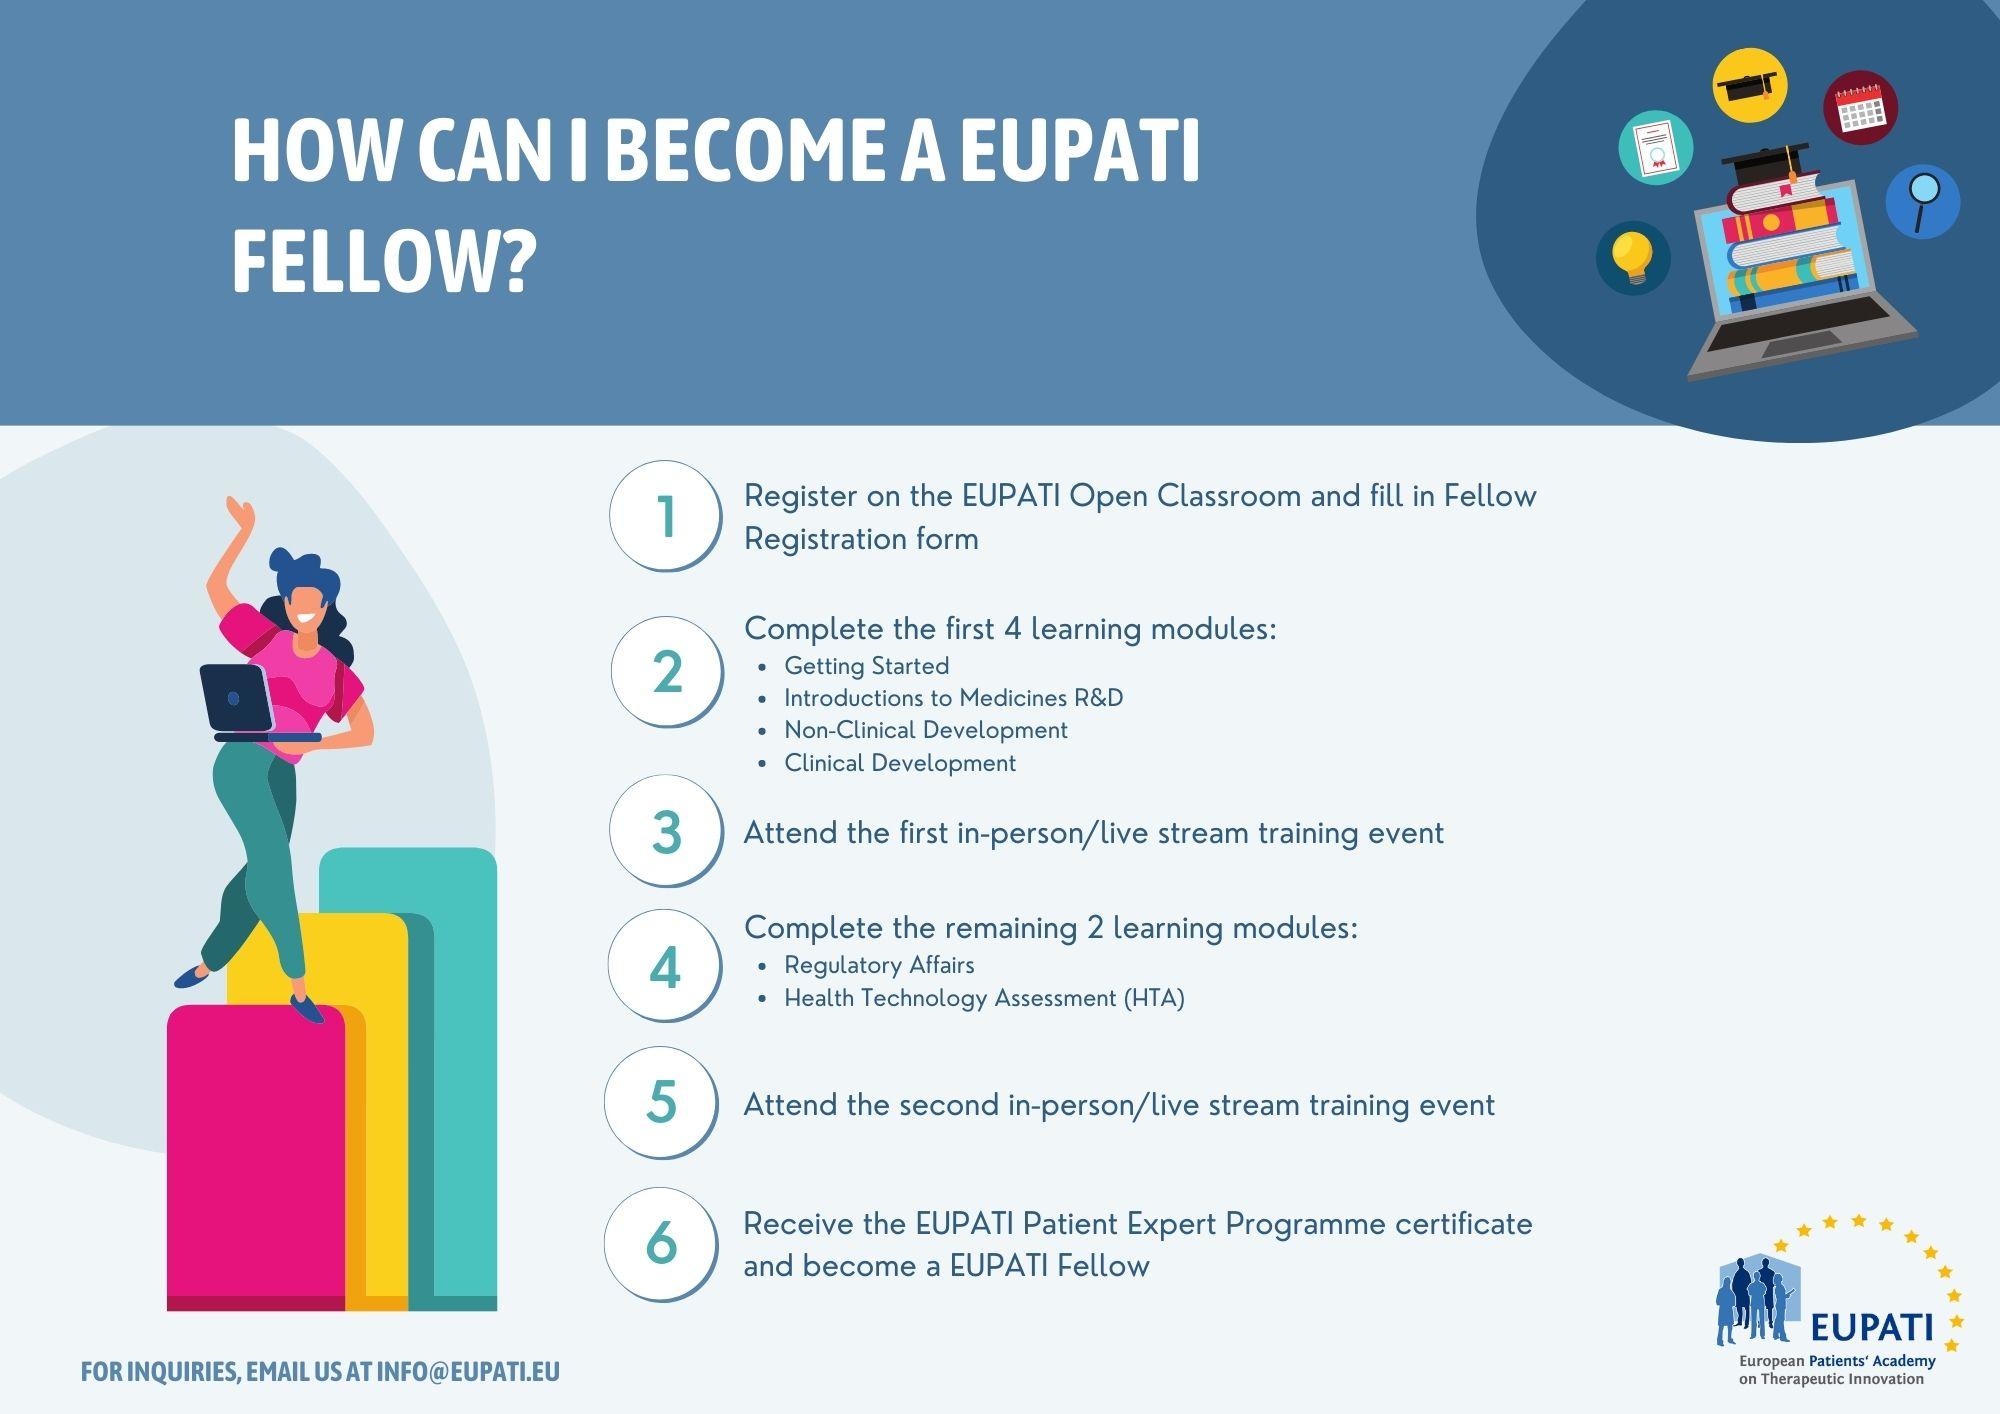 How can I become a EUPATI Fellow?